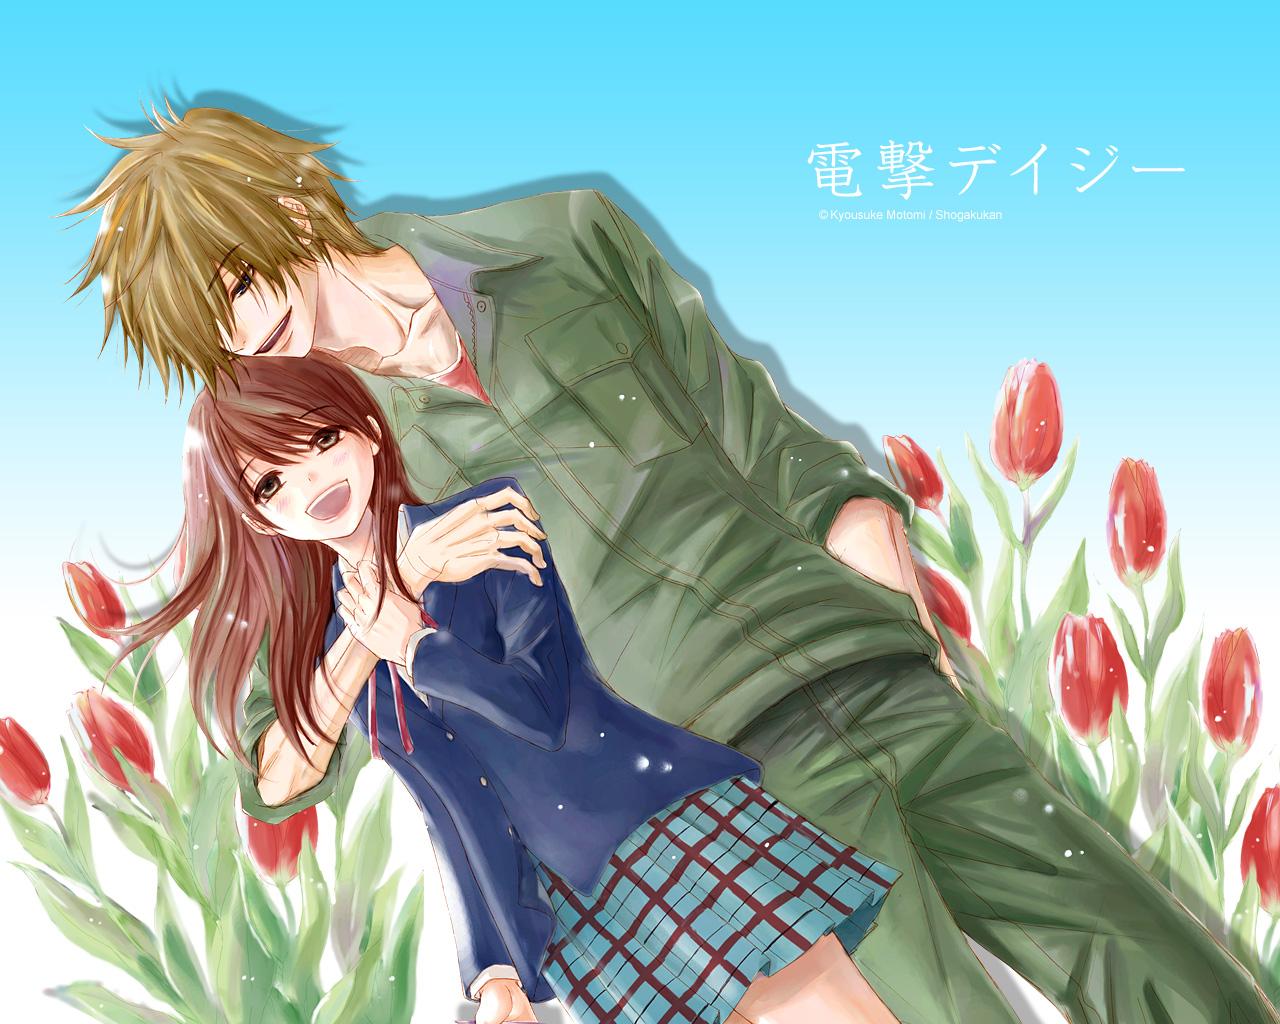 dengeki daisy anime - photo #12